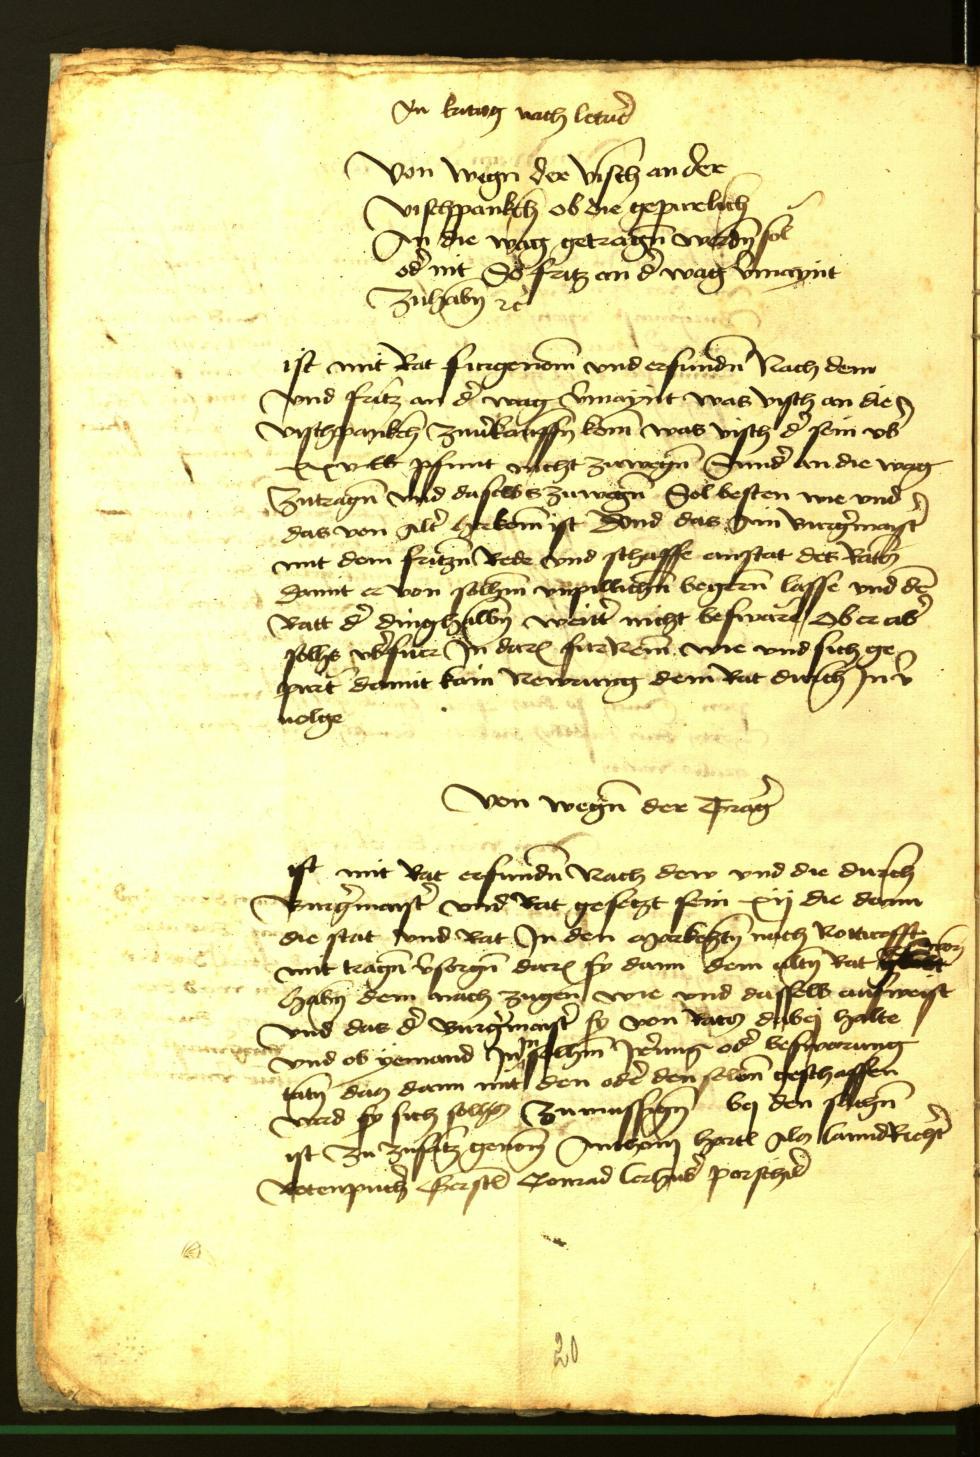 Stadtarchiv Bozen - BOhisto Ratsprotokoll 1472 fol. 4v